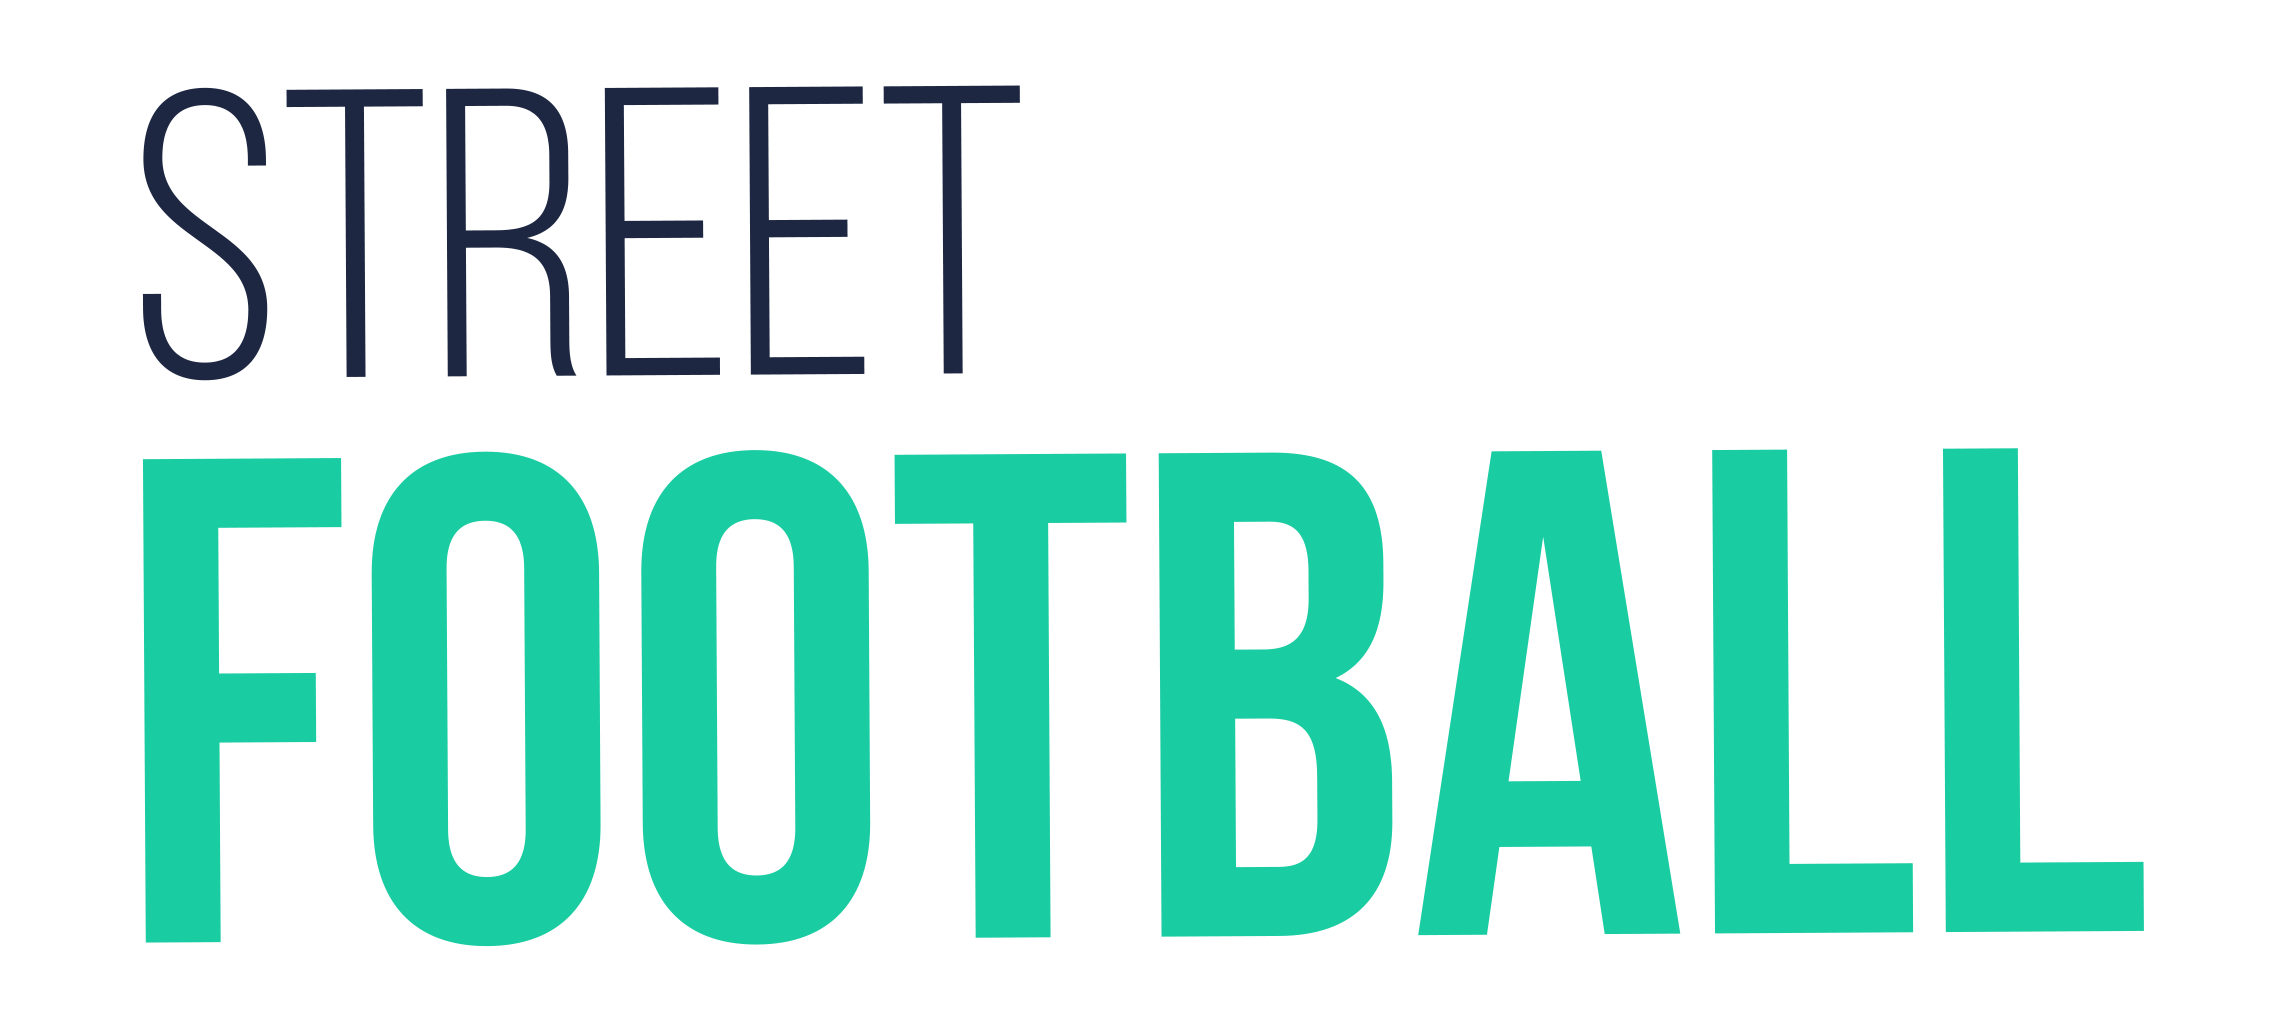 Streetfootball